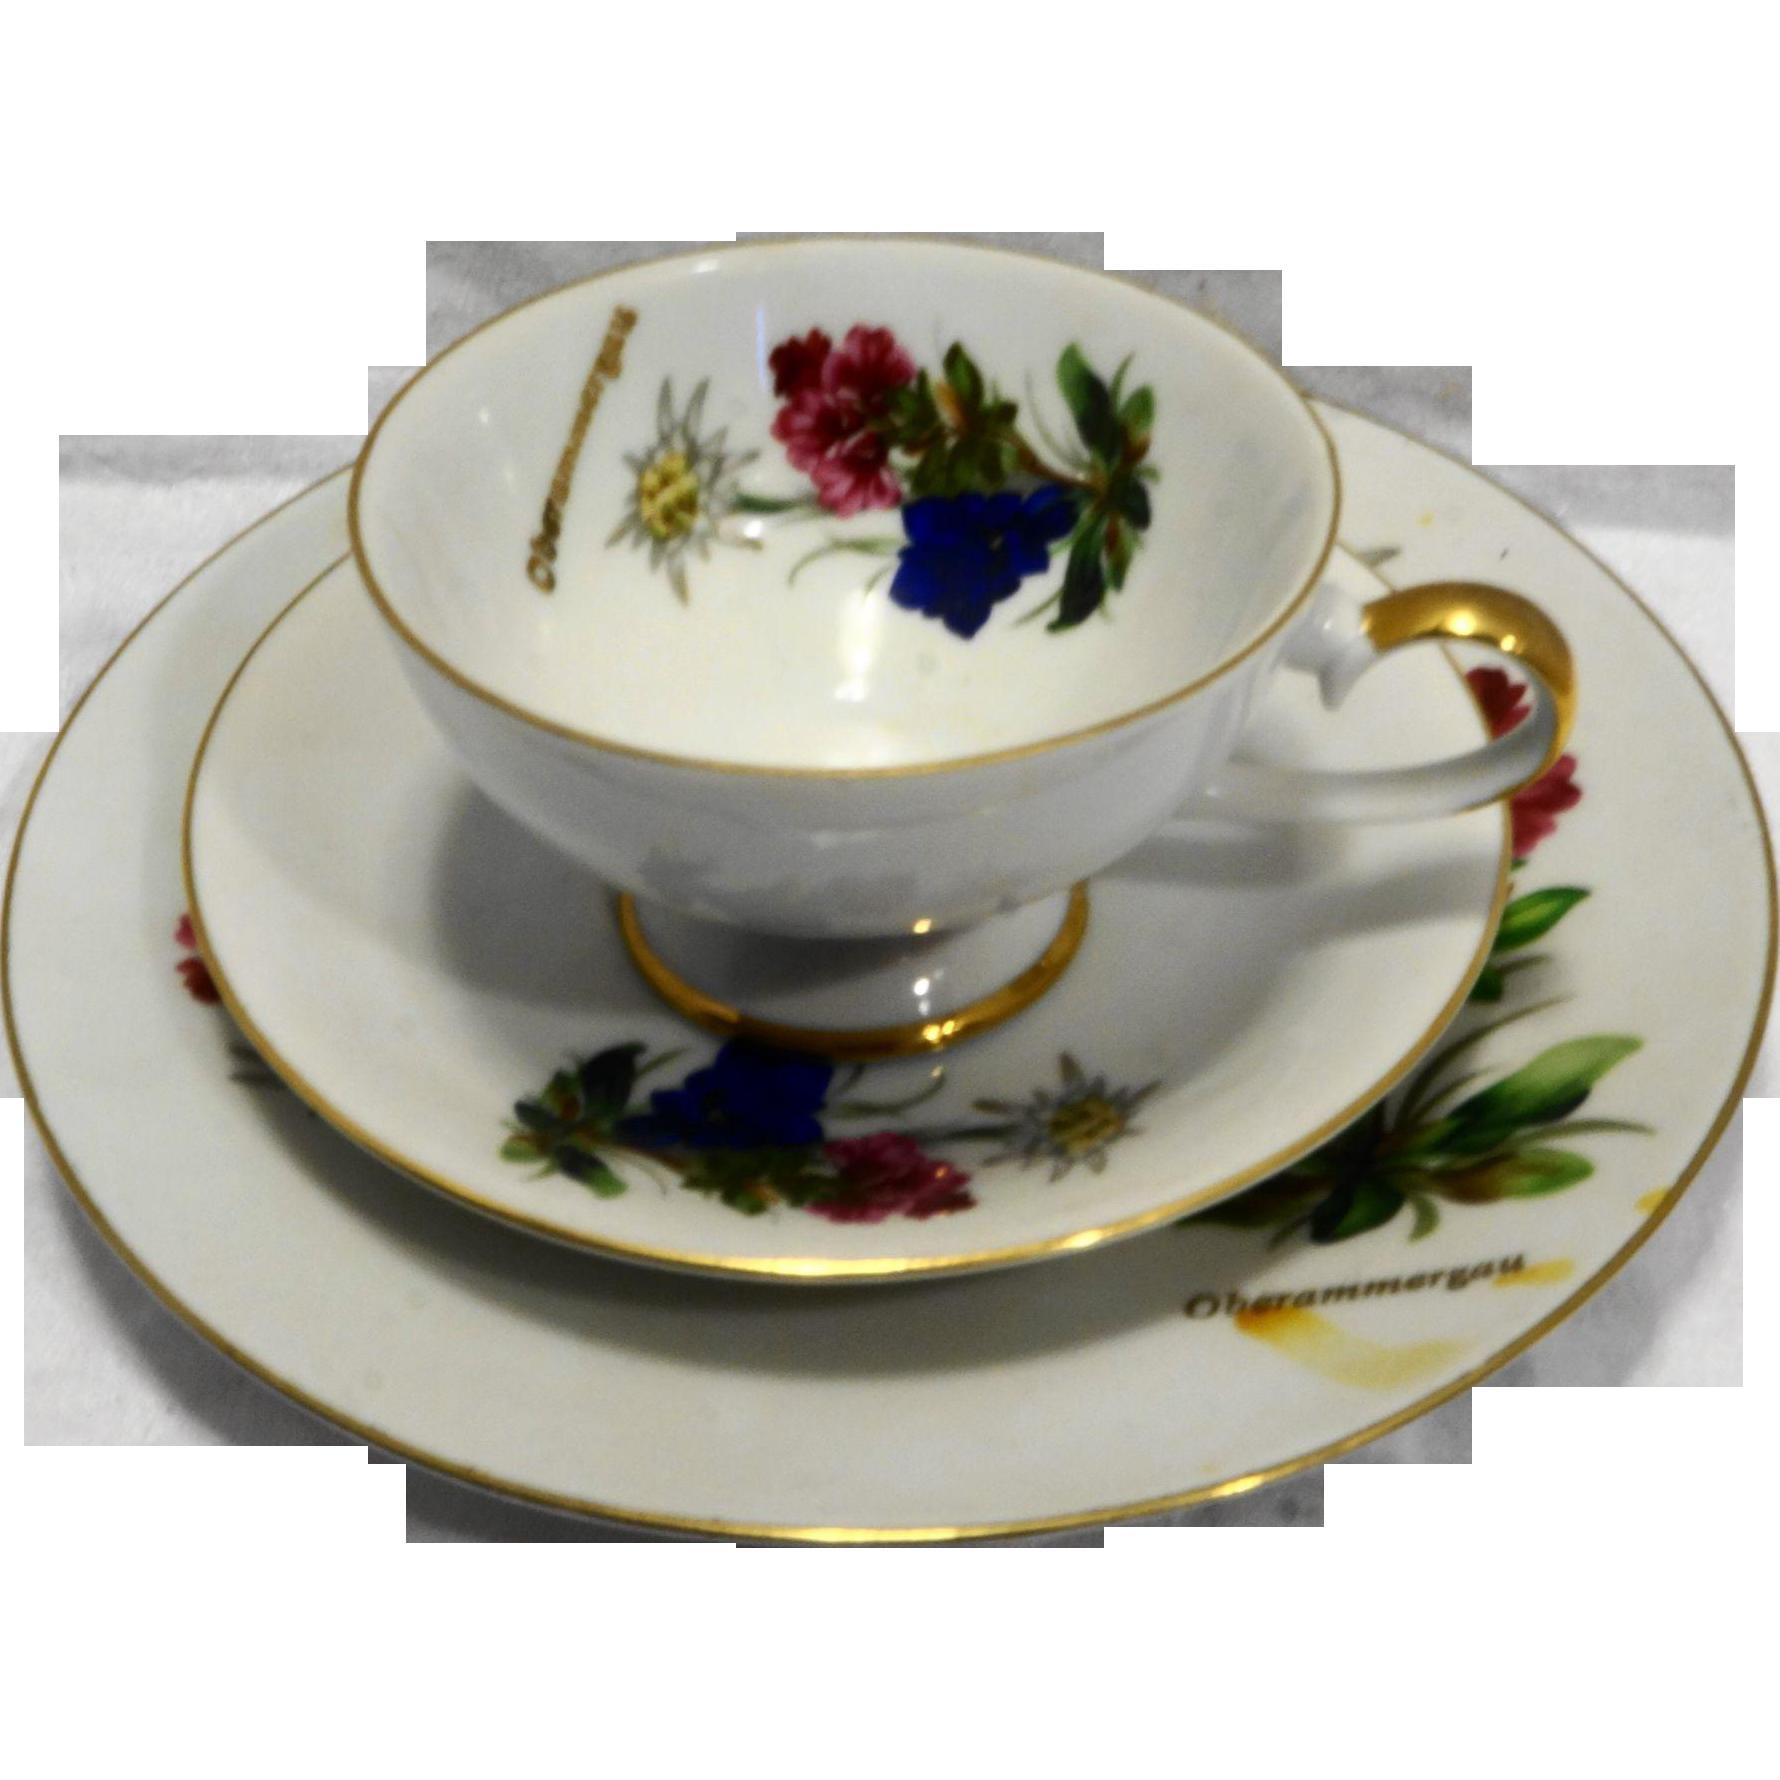 Bareuther Waldsassen Bavaria Tea Trio Floral Oberammergau Souvenir